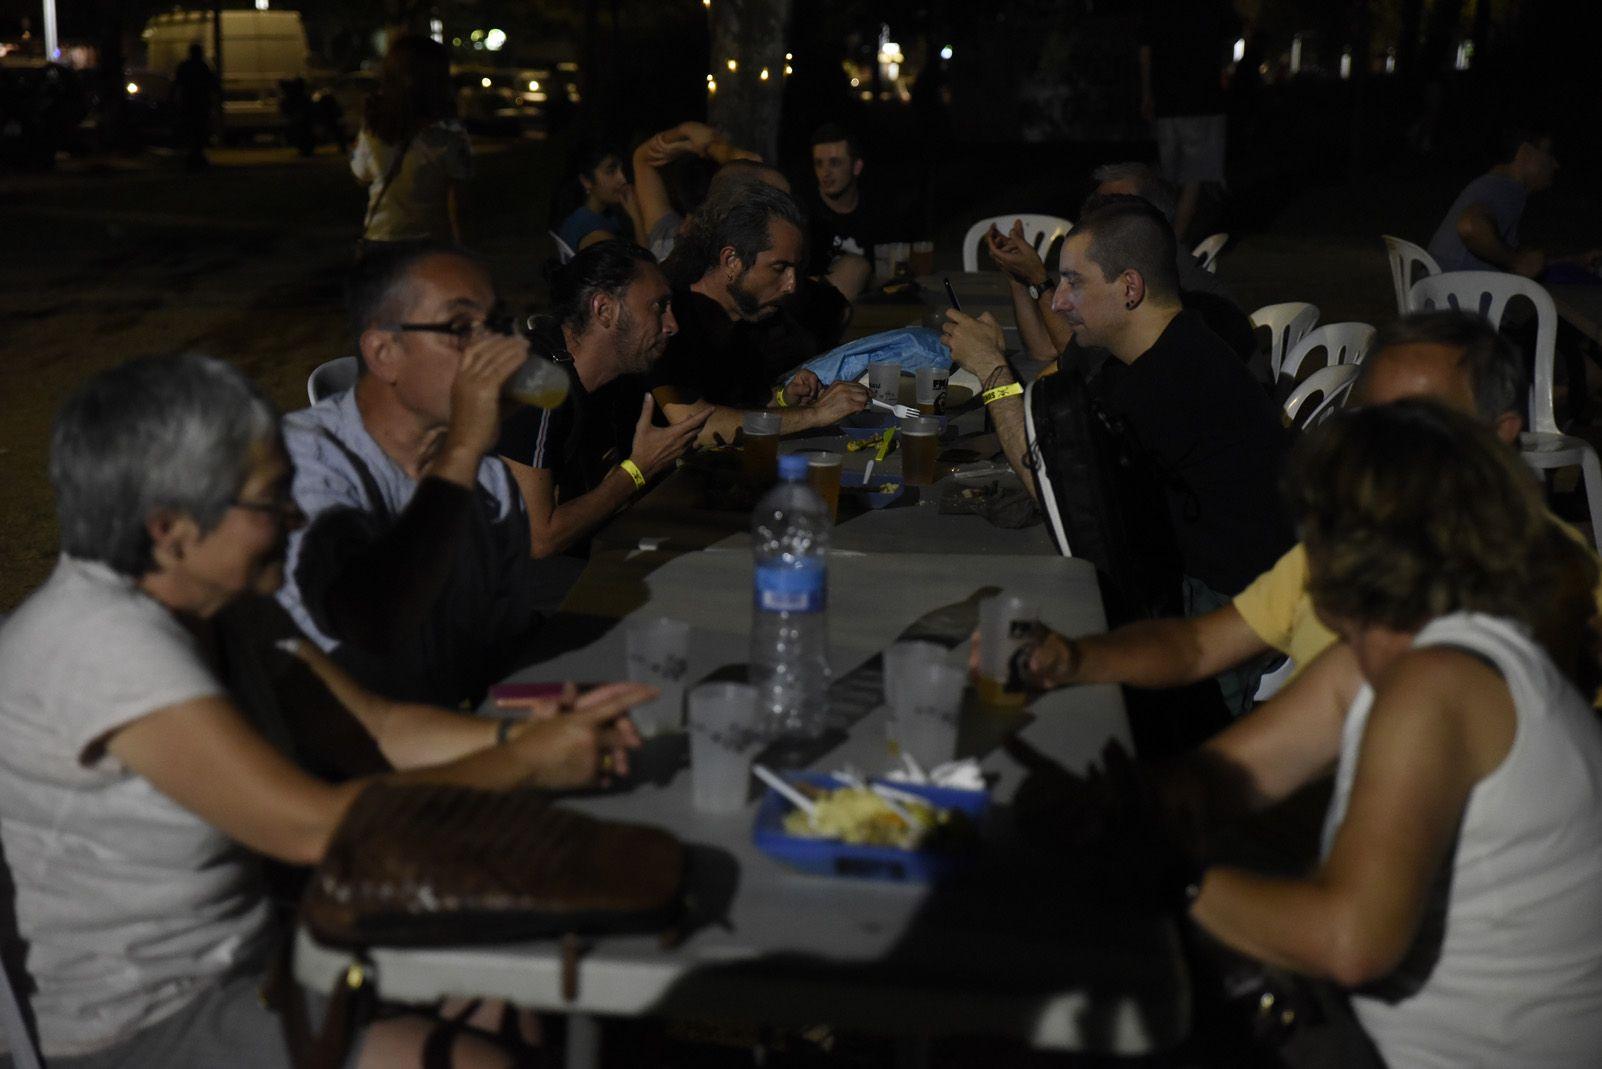 Sopar Islamic del Vallès de la Festa Major Alternativa. Foto: Bernat Millet.